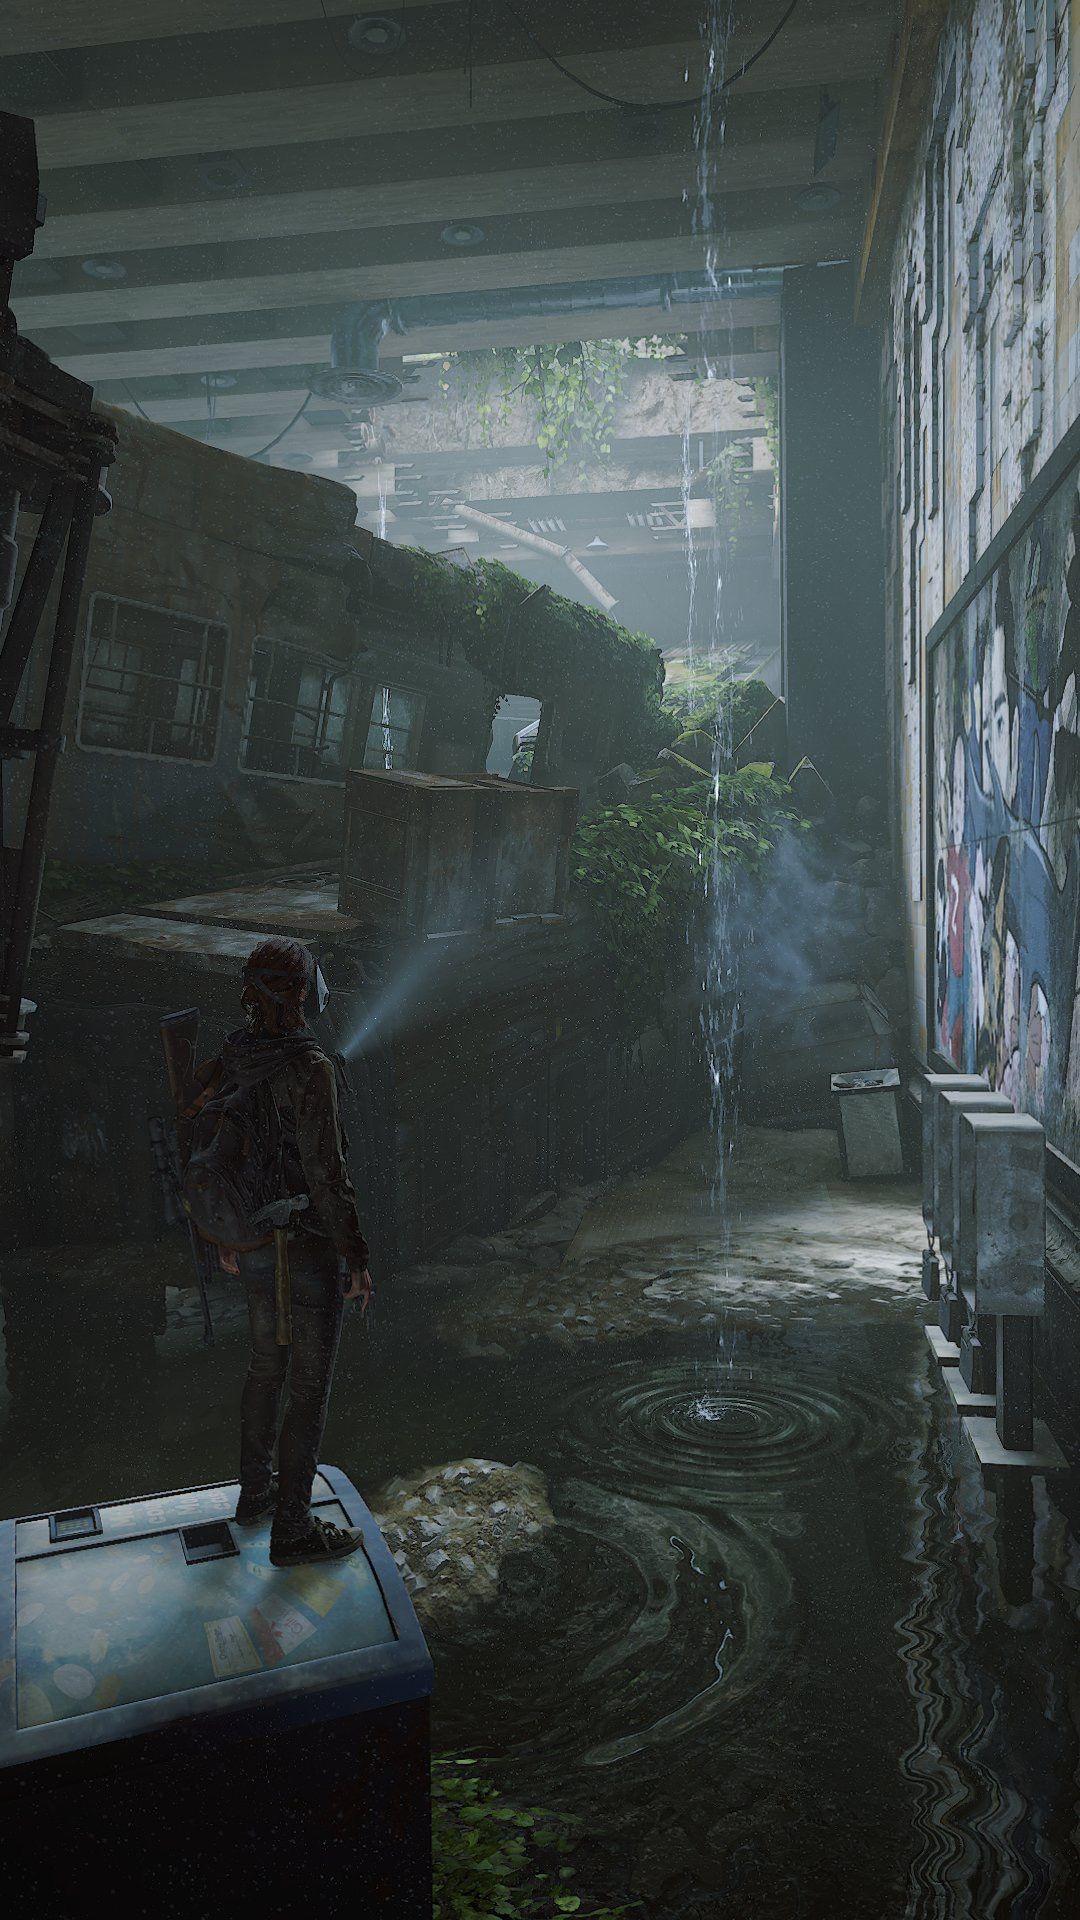 Pin De Tomas Curetti Em The Last Of Us Ilustracoes Conceituais Inspiracao Para Historias Arte Pos Apocaliptica